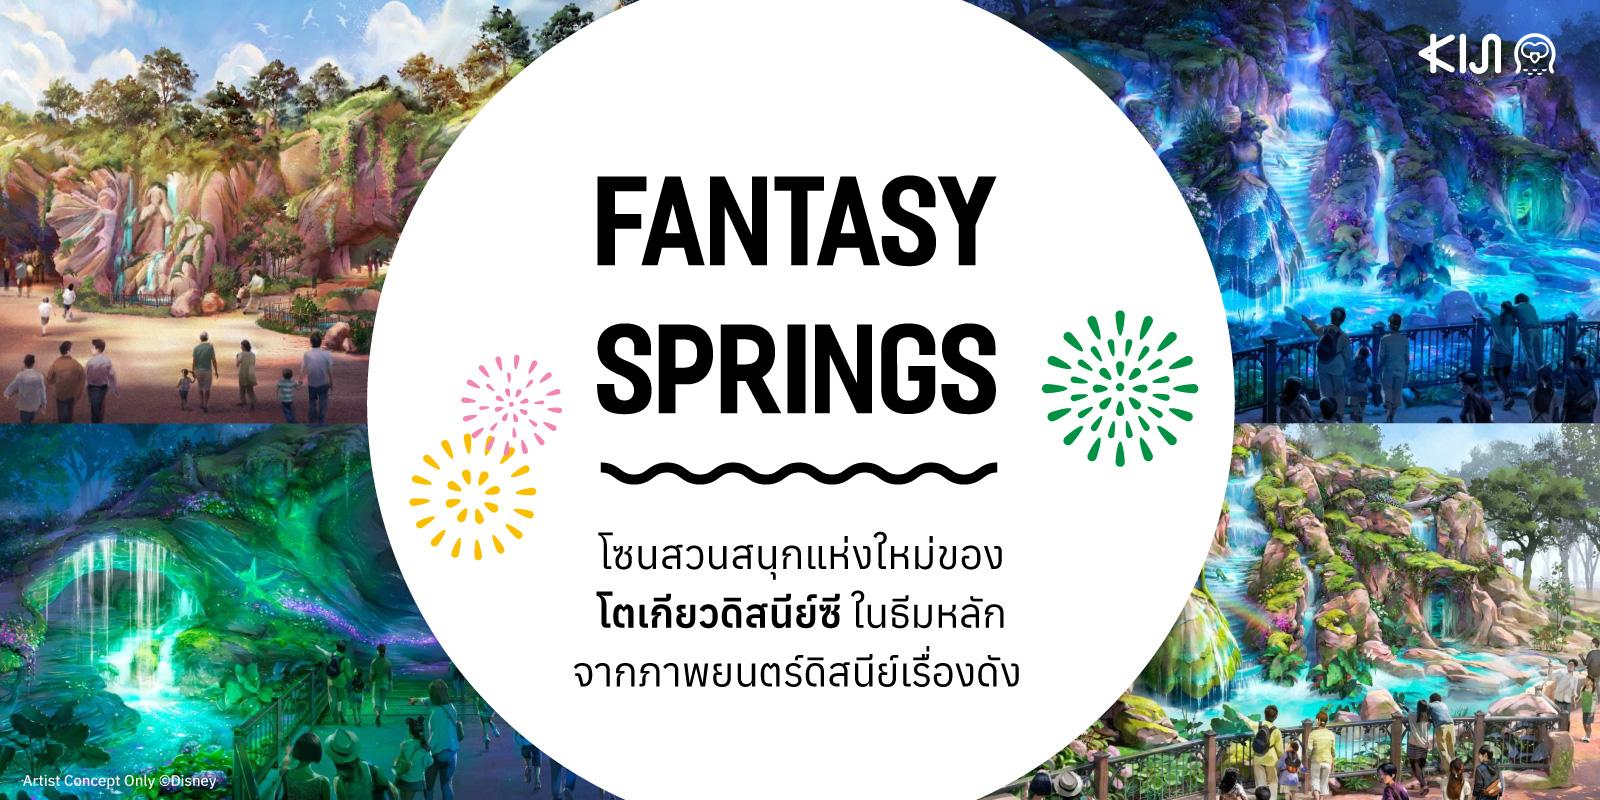 Fantasy Springs สวนสนุกโซนใหม่ใน Tokyo DisneySea